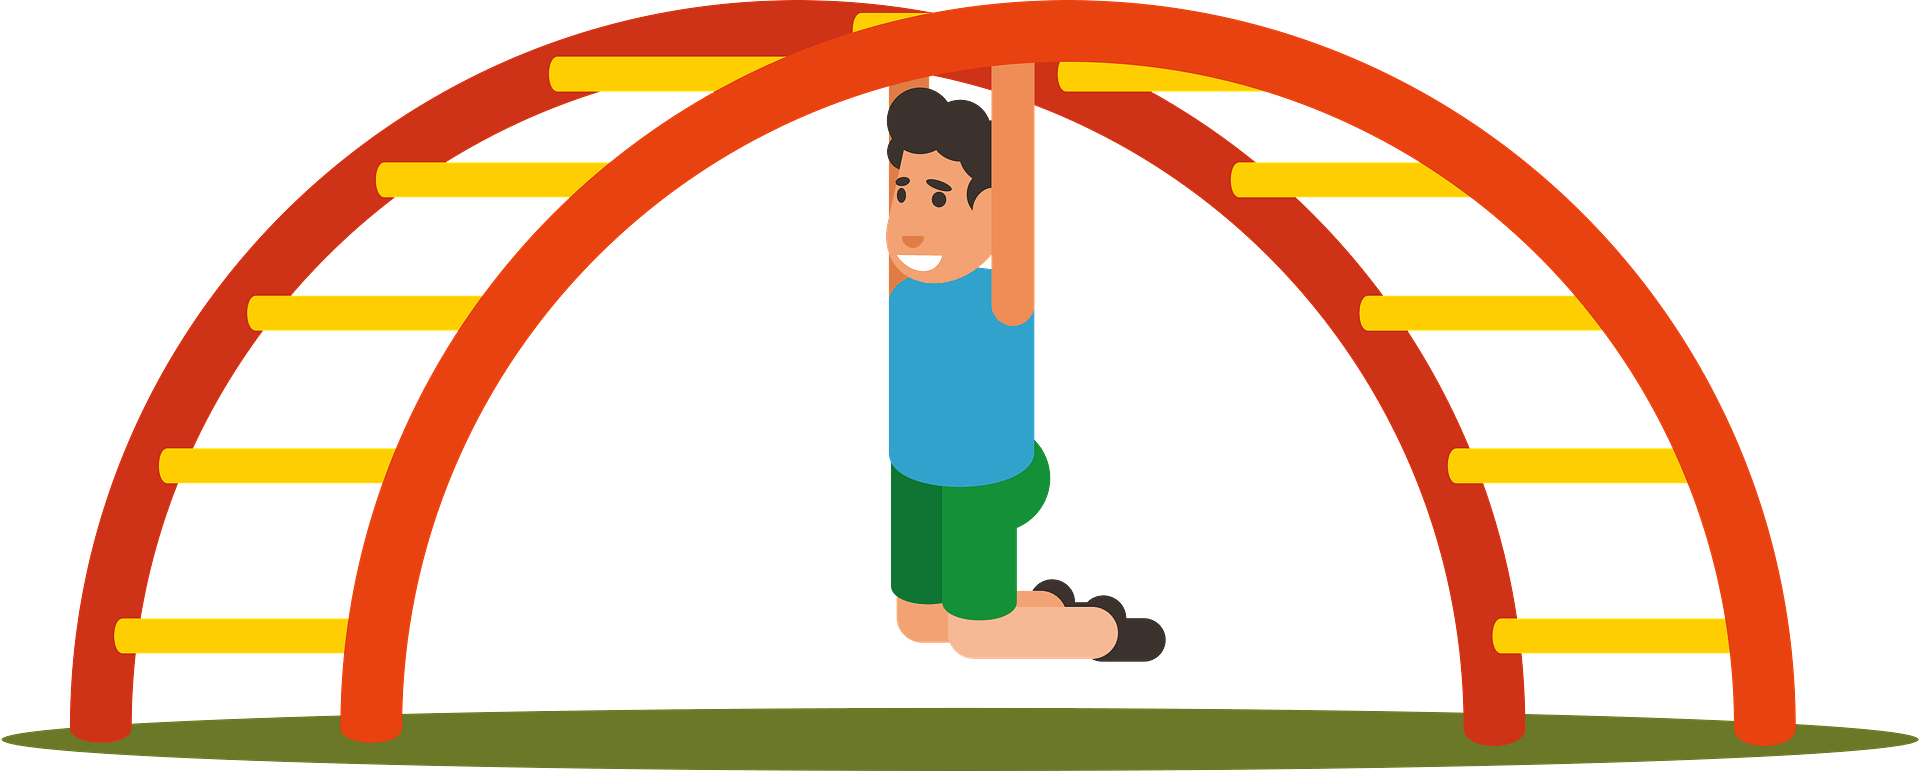 Playground clipart transparent 1